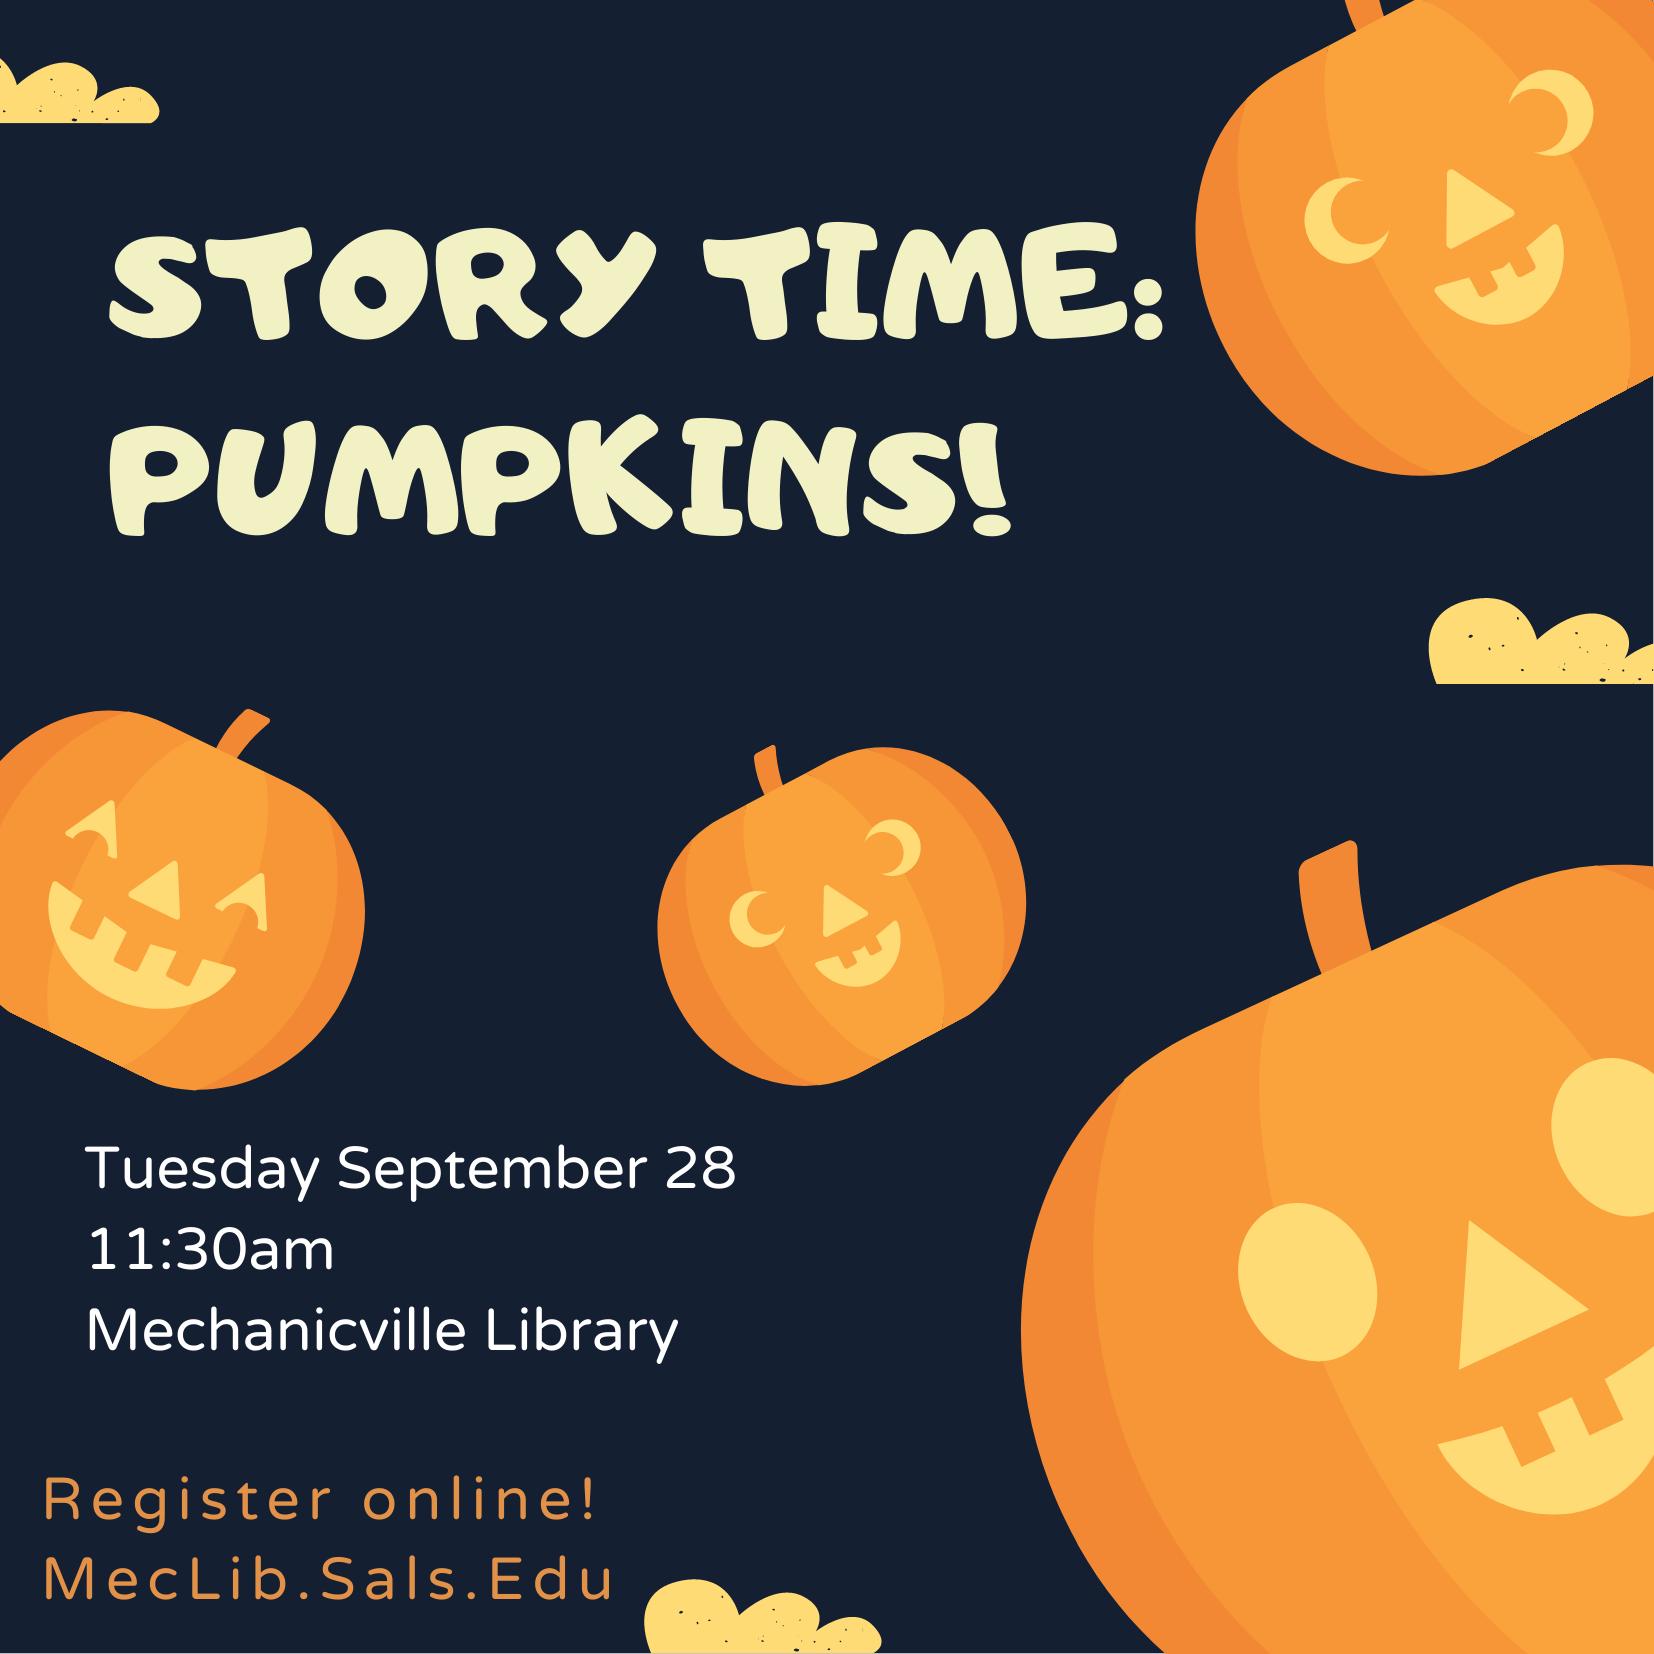 Story Time: Pumpkins